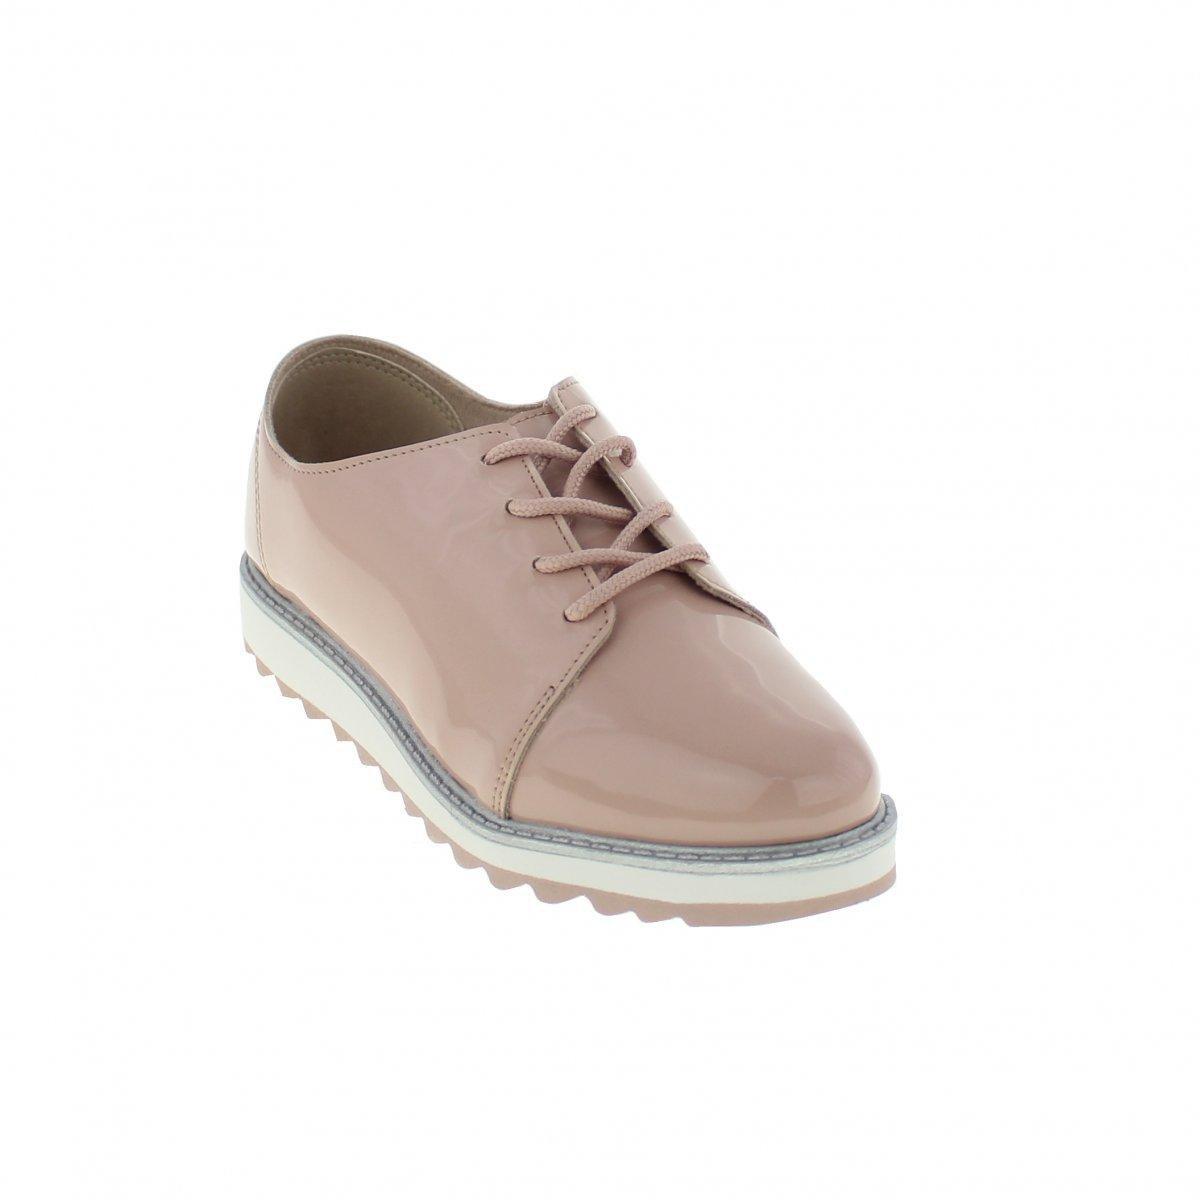 ceb036988 Sapato infantil oxford molekinha verniz feminino rosa compre jpg 544x544  Sapato infantil oxford molekinha verniz preto